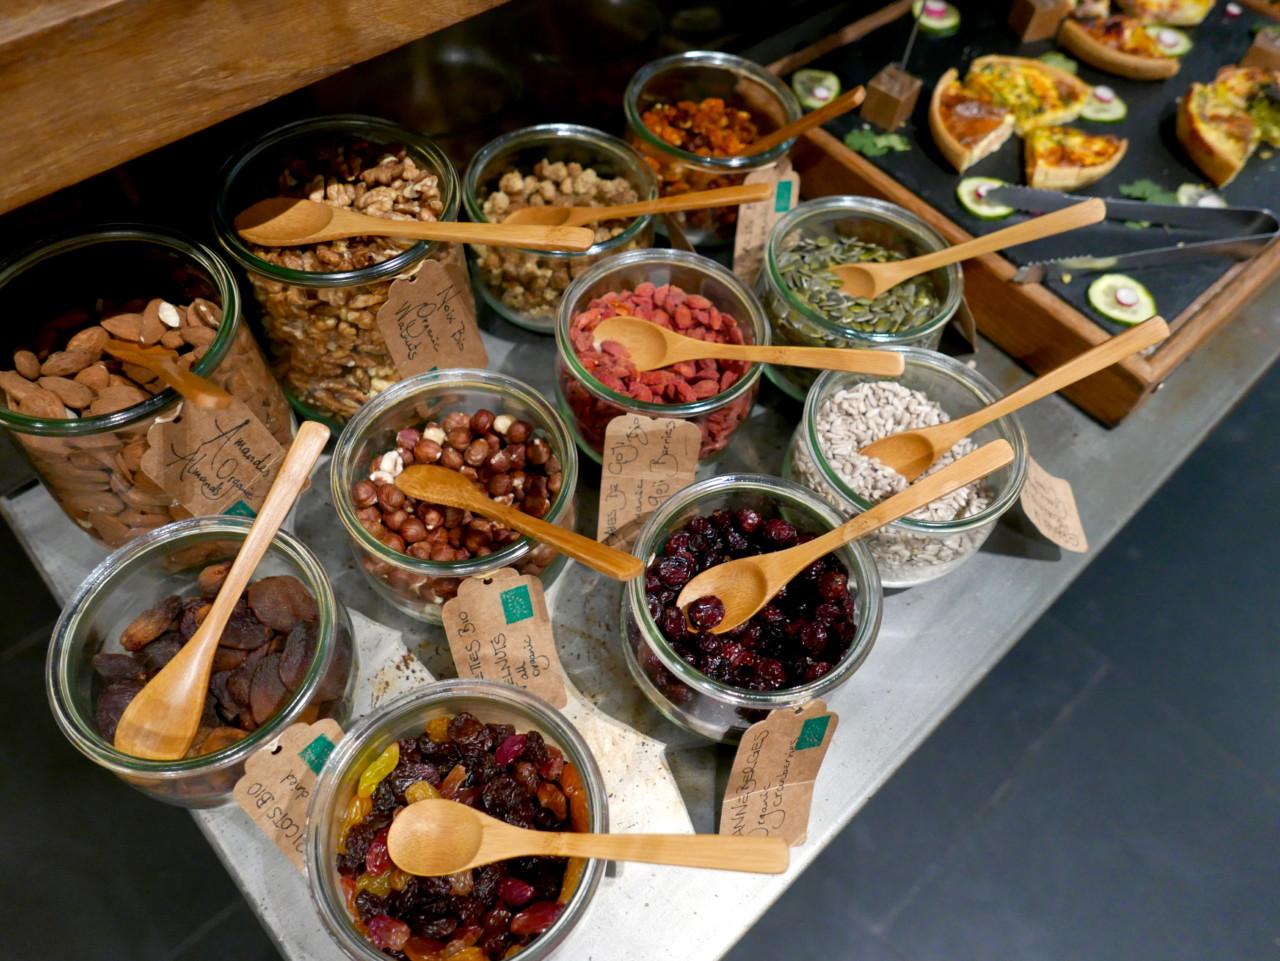 breakfast-frokost-the-hidden-hotel-paris-organic-homemade